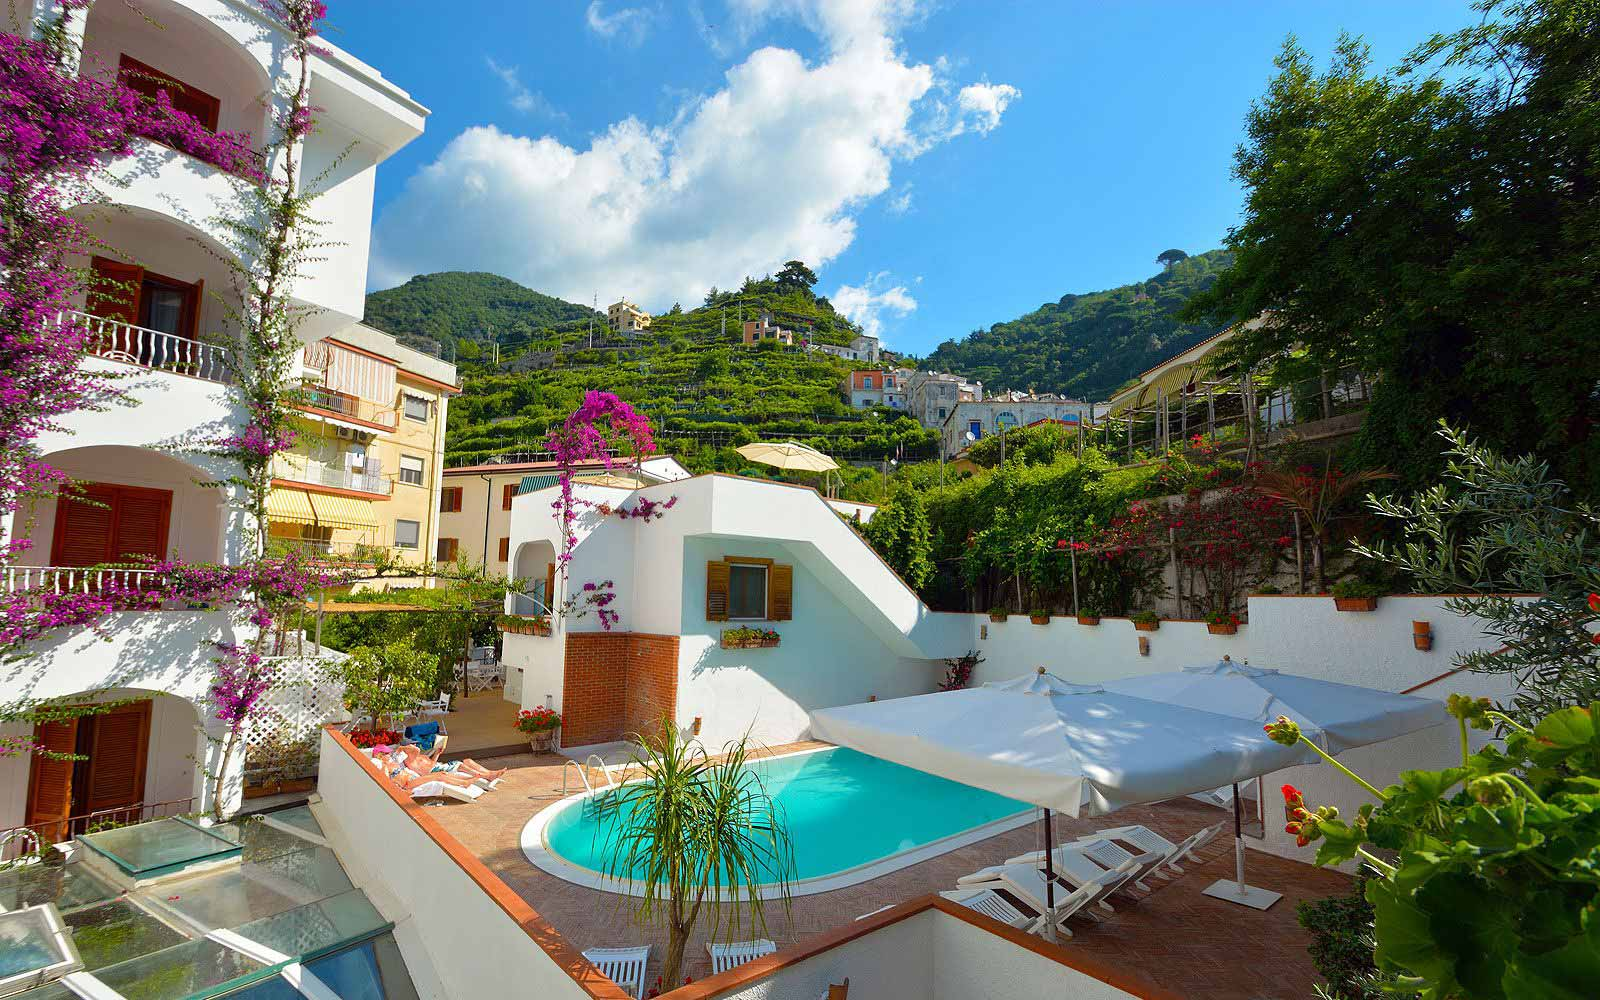 Landscape views at Hotel Villa Romana